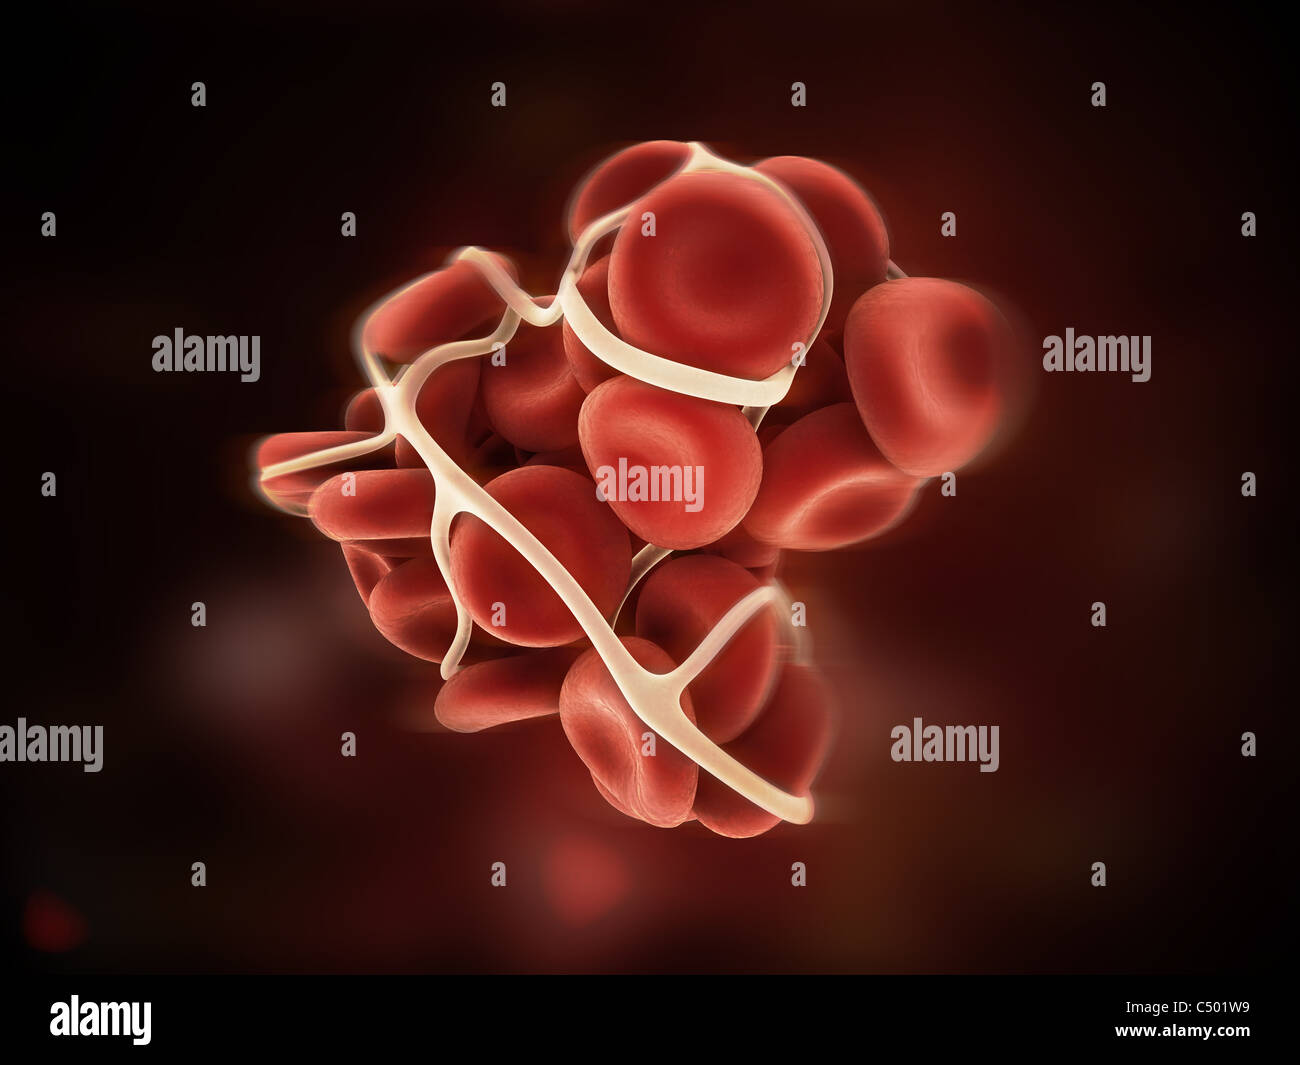 blood clot - Stock Image